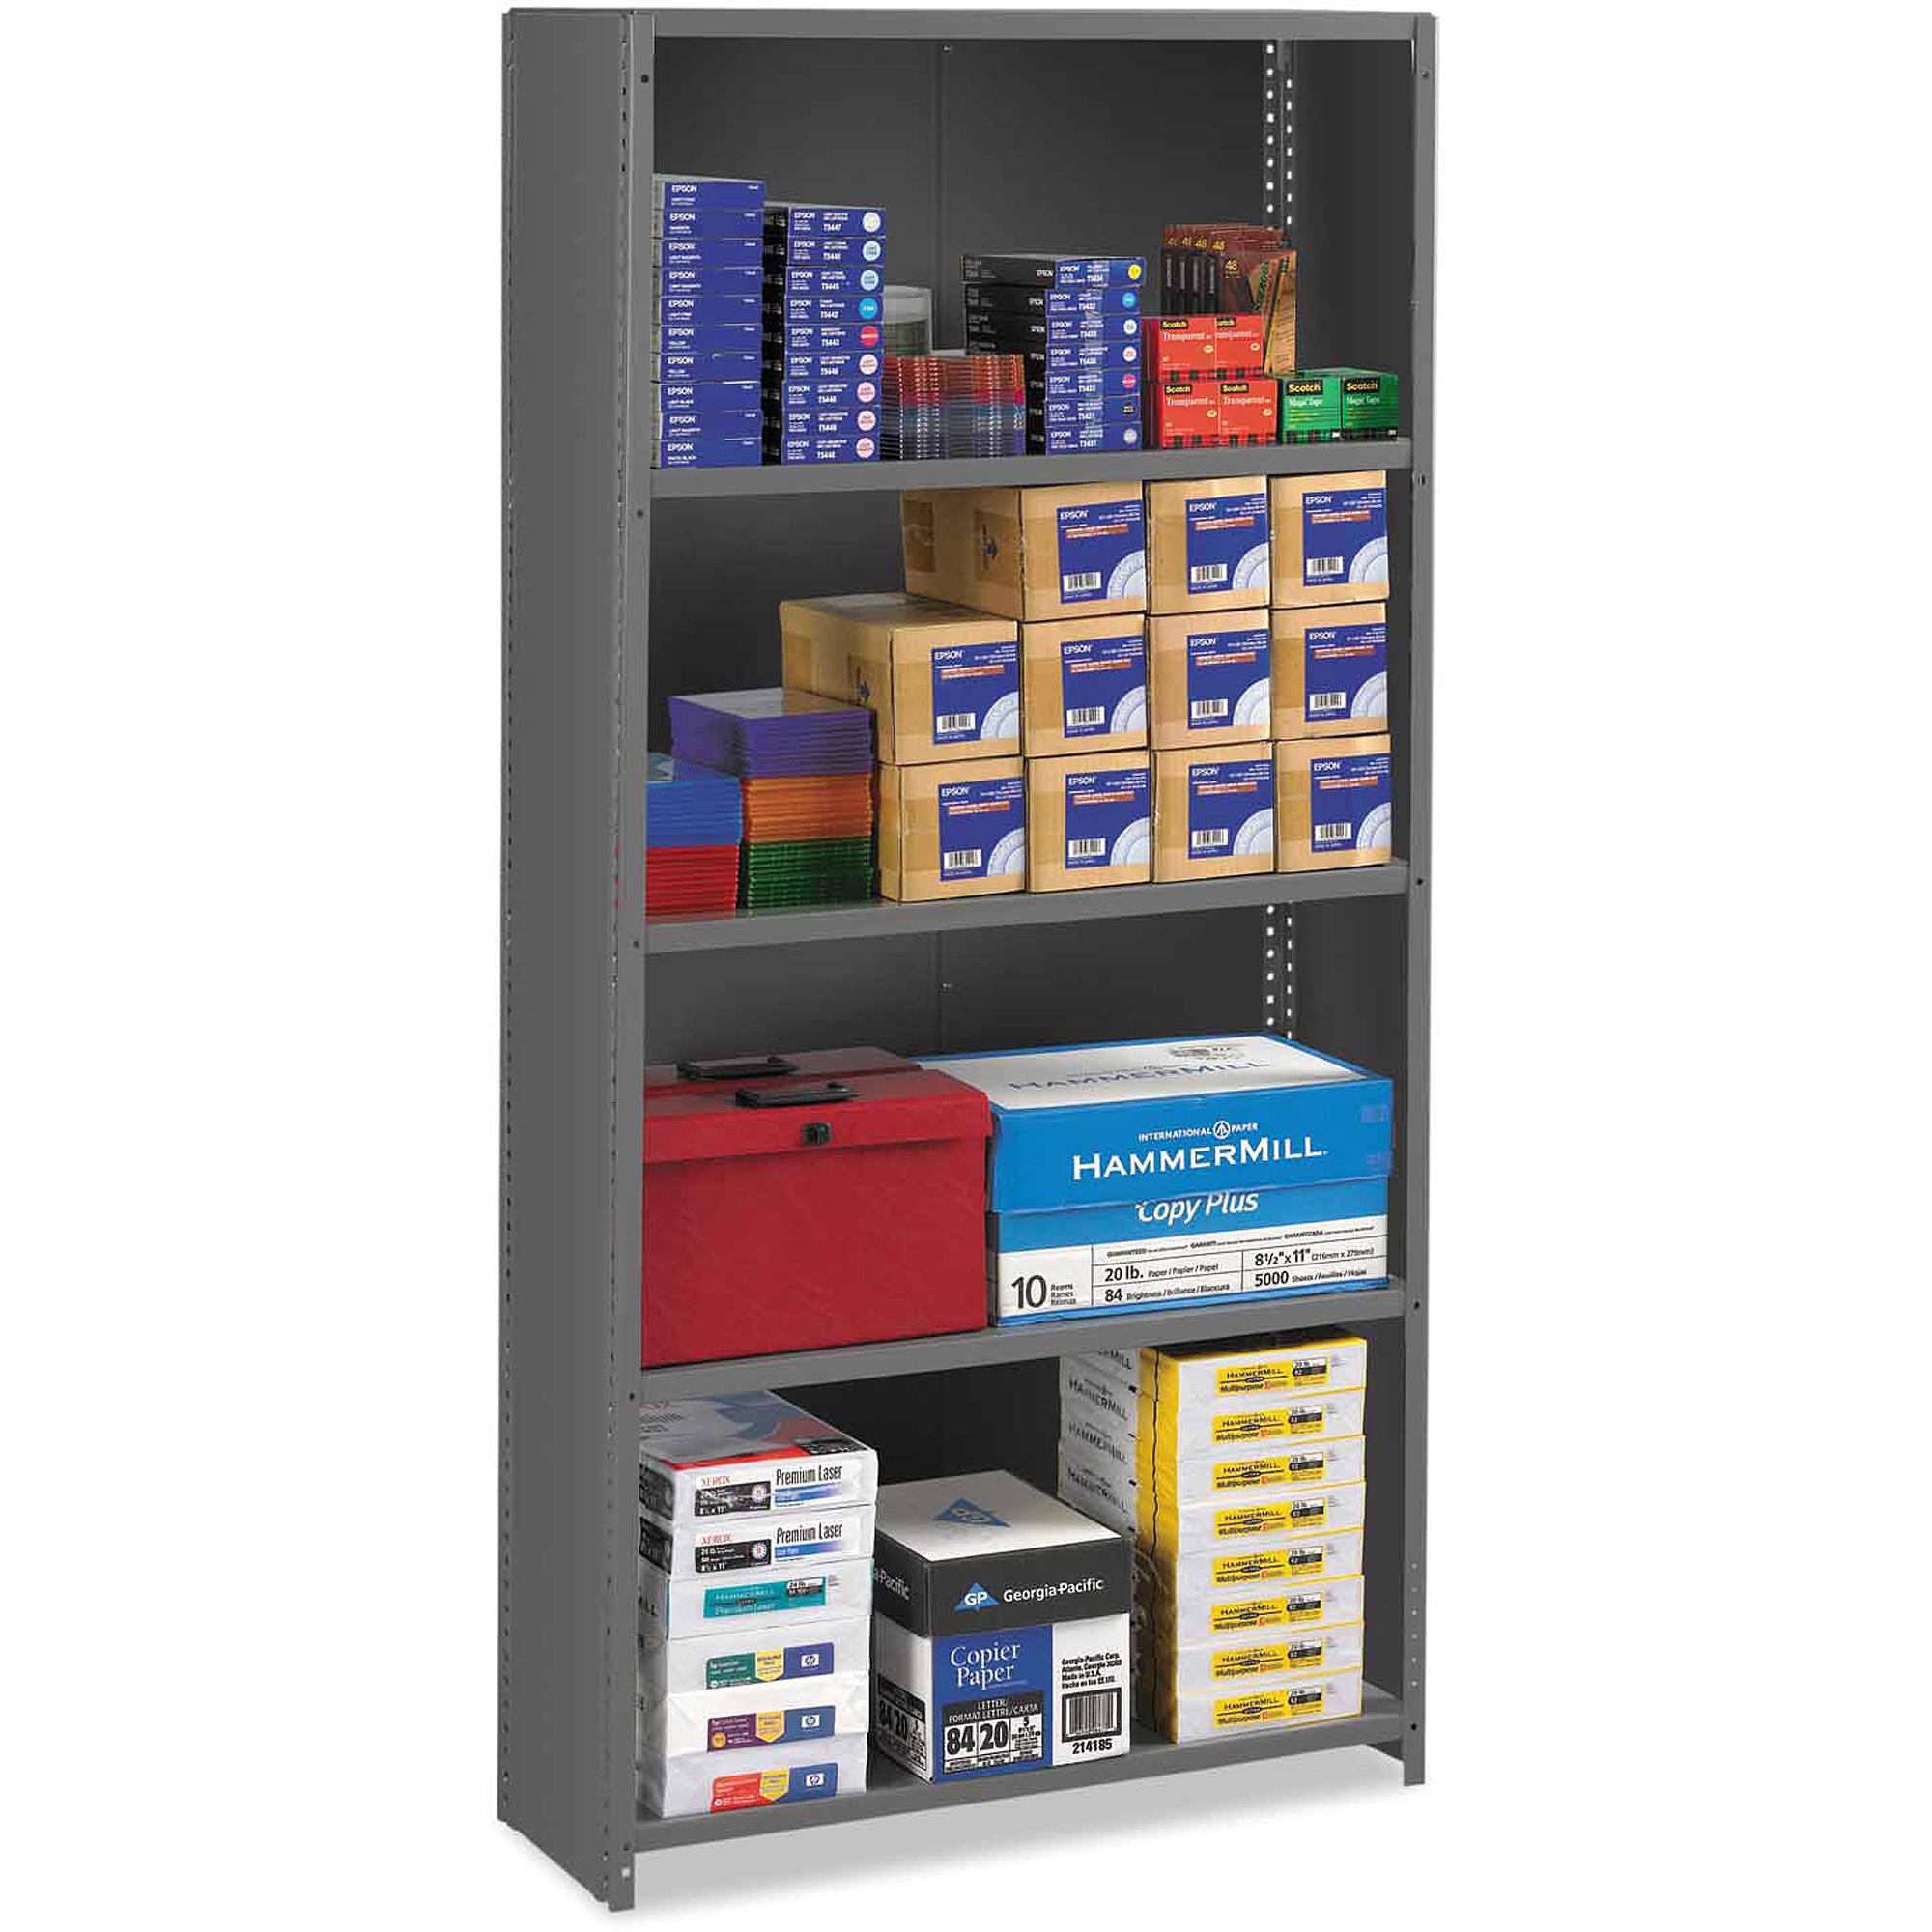 Tennsco 5-Shelf Closed Commercial Steel Shelving, Medium Gray